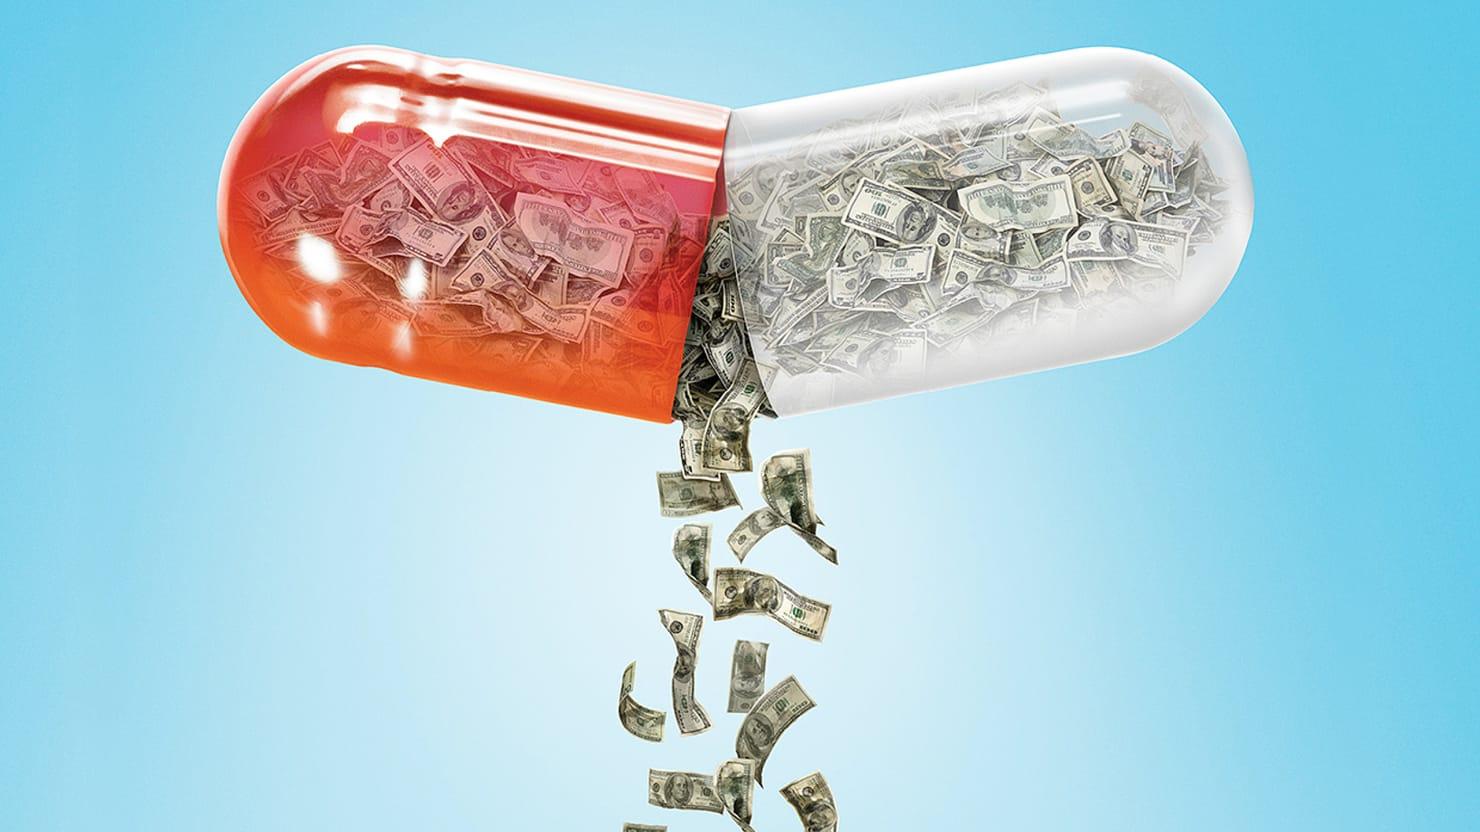 The Billion-Dollar Rehab Racket That Drains Family Savings